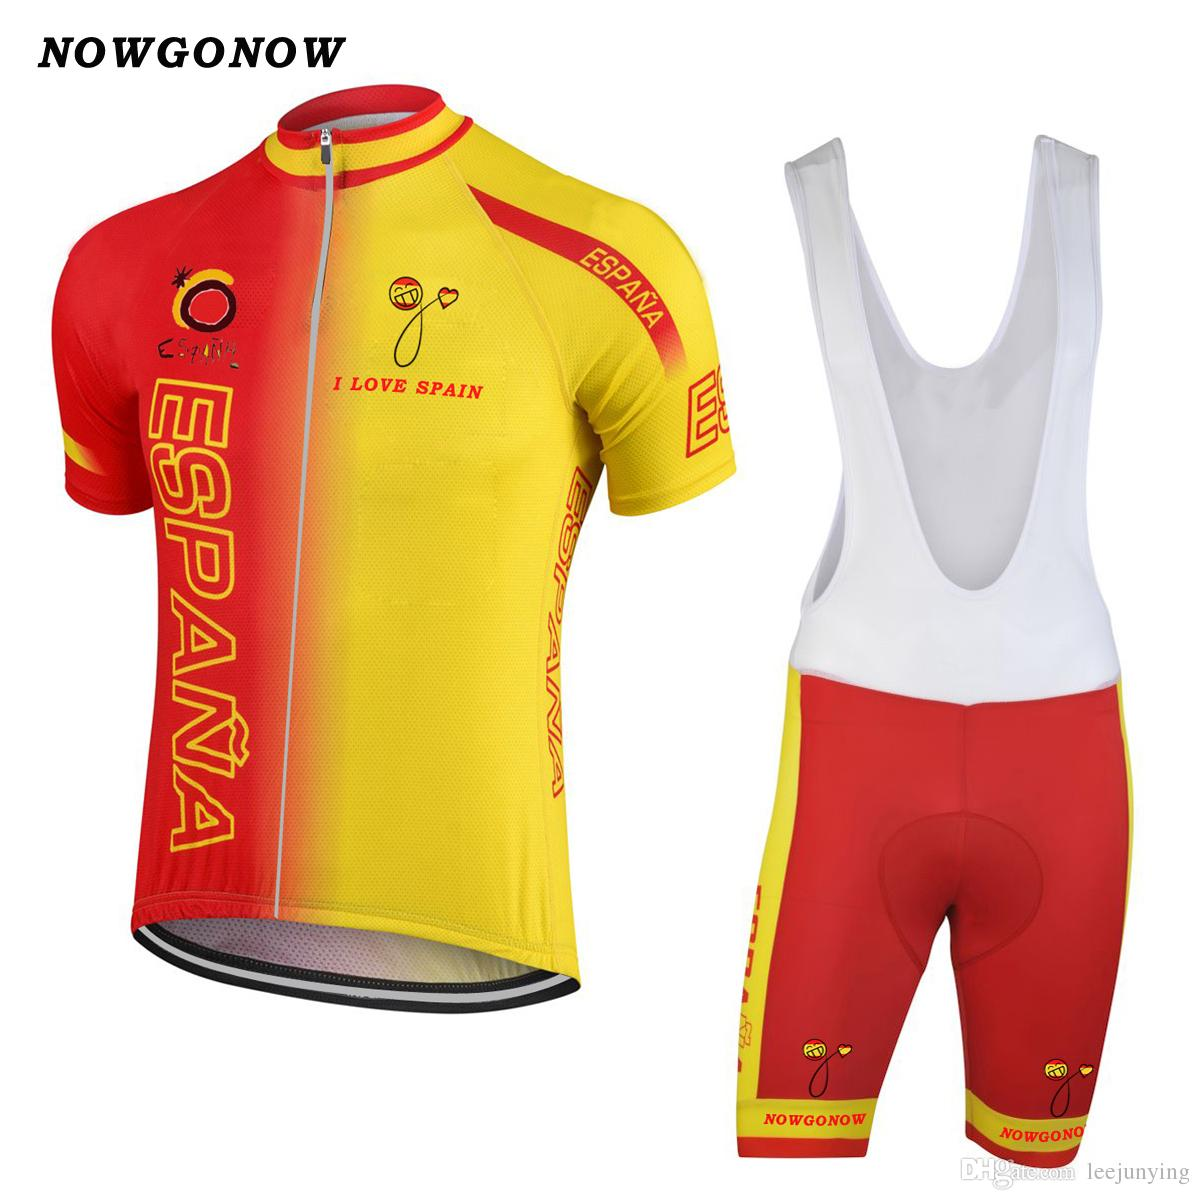 MEN 2017 Spain National Team Cycling Jersey Set Bike Clothing Wear Yellow  Red National Team Maillot Ciclismo Bib Gel Pad Shorts Bike Shirt Cycling  Outfit ... 4bf2b4586